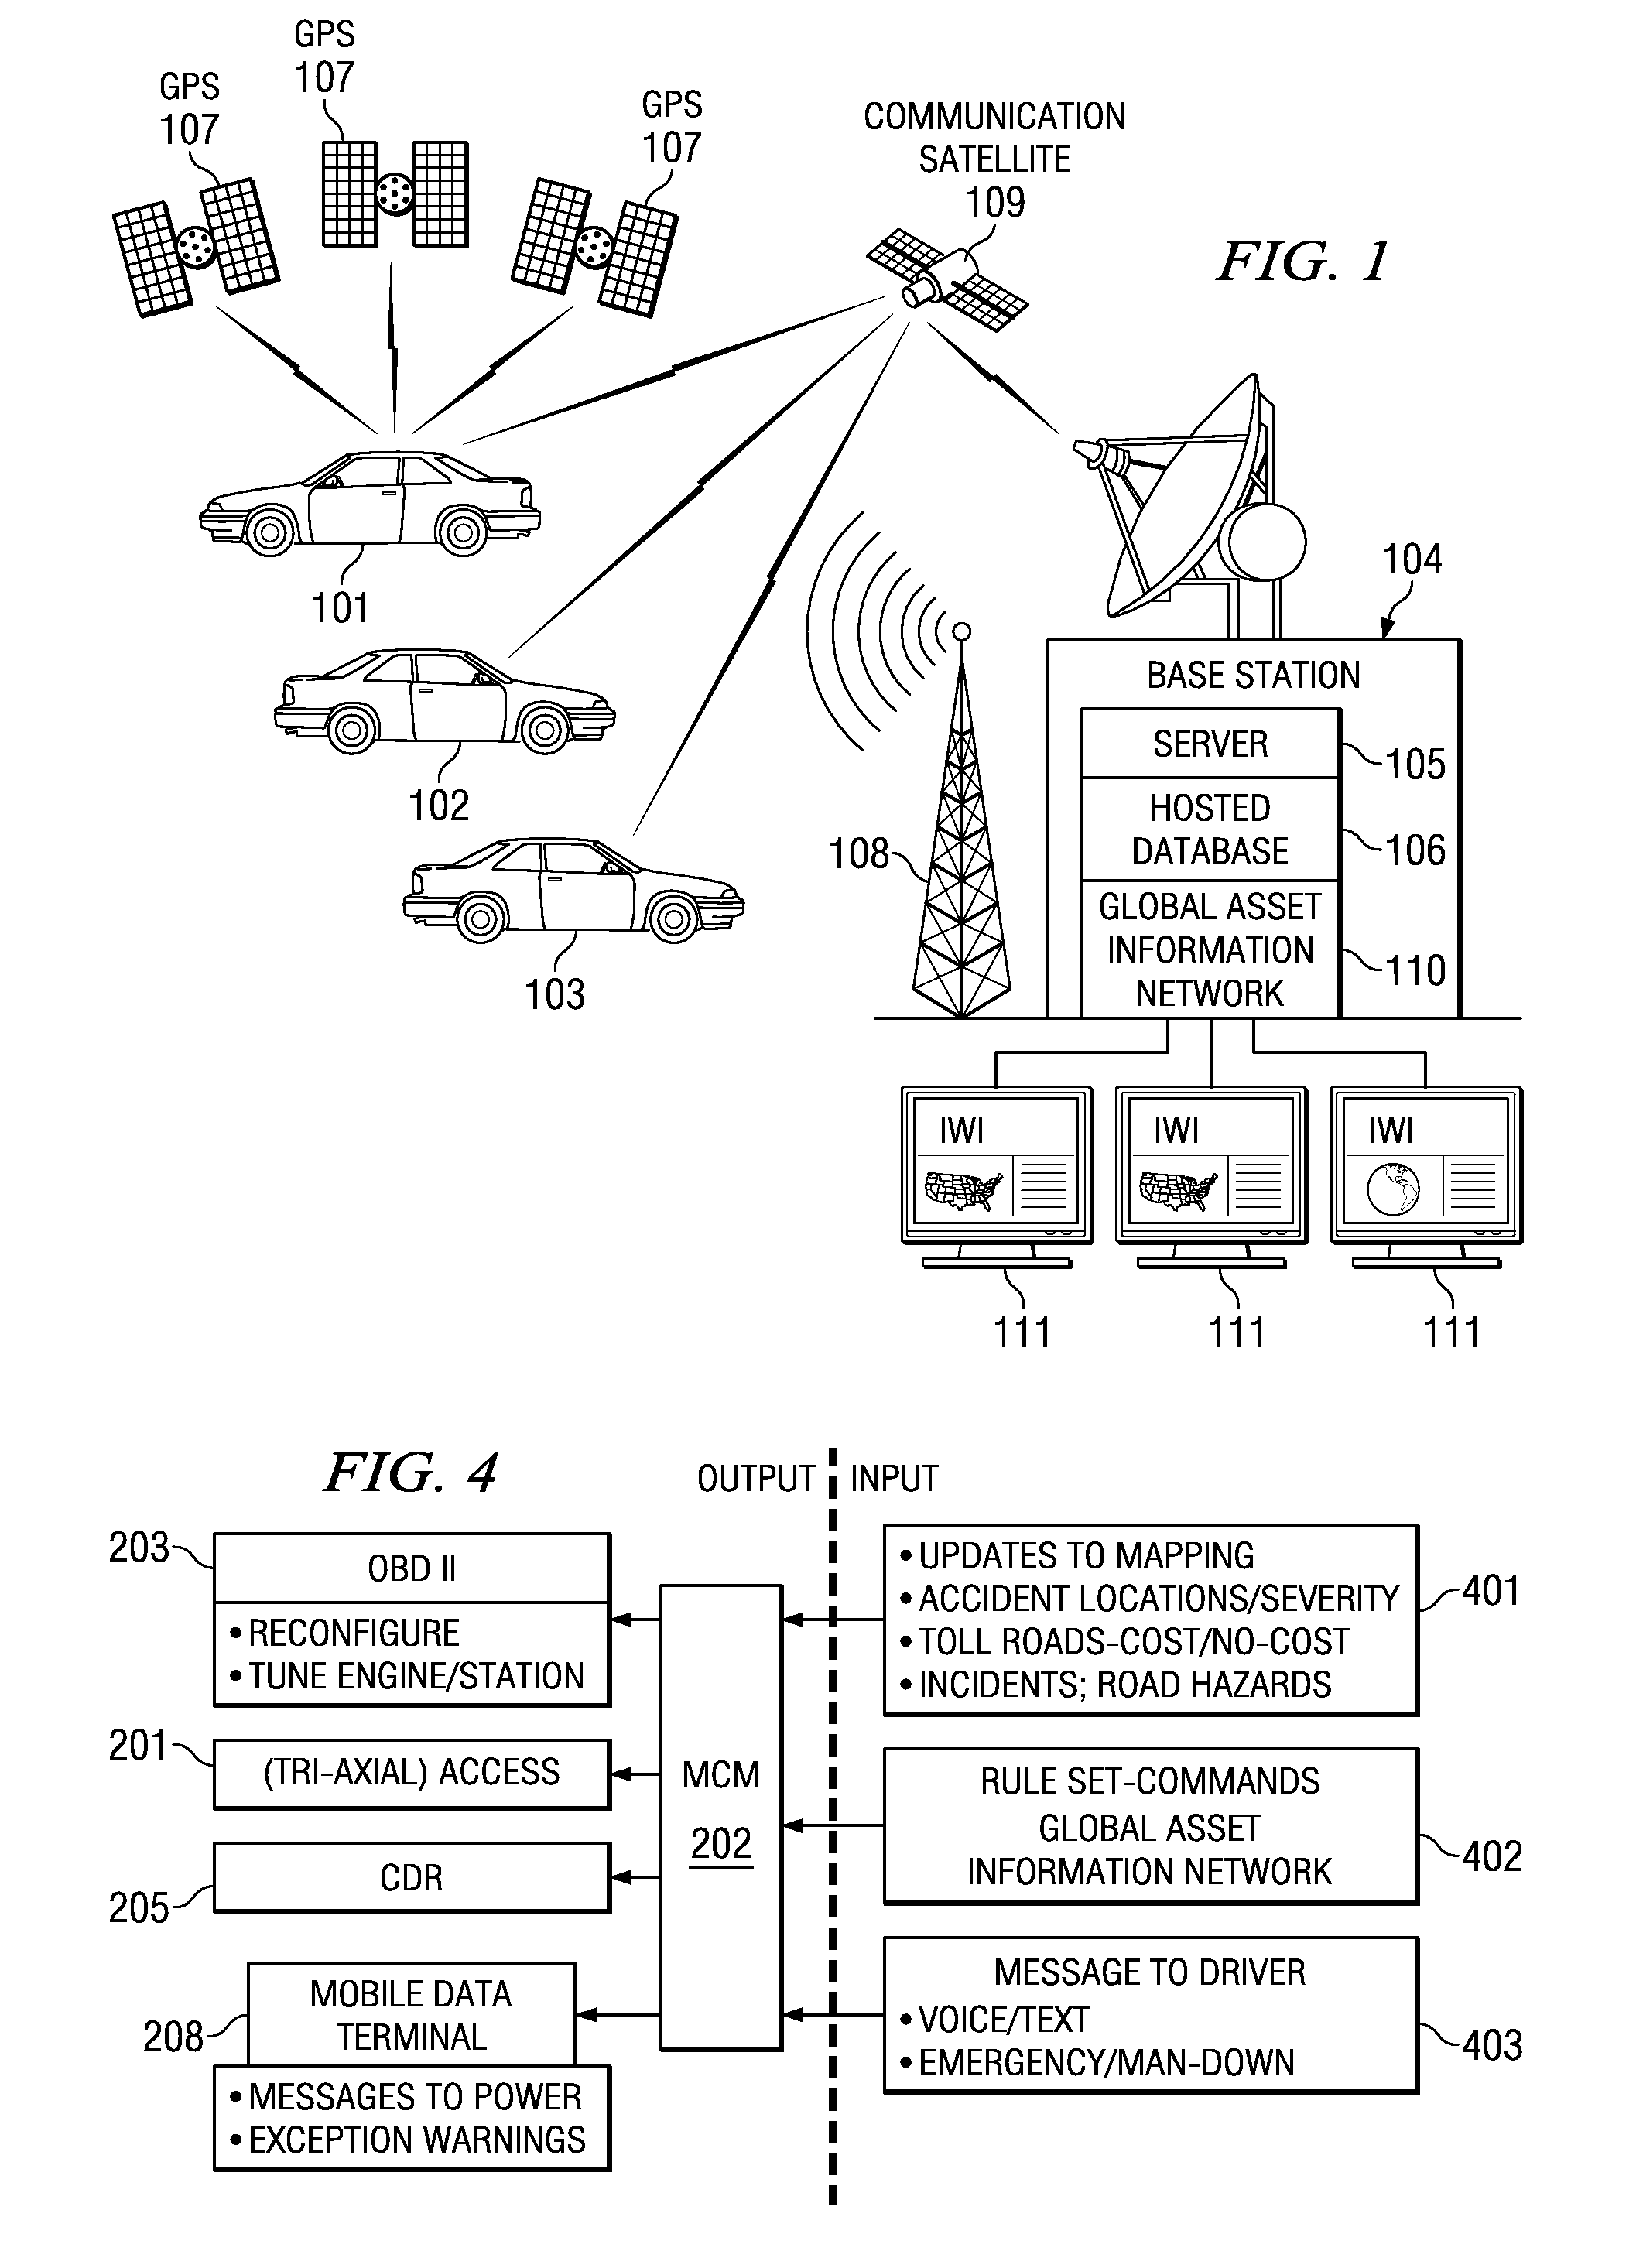 Patent US 9,847,021 B2 on